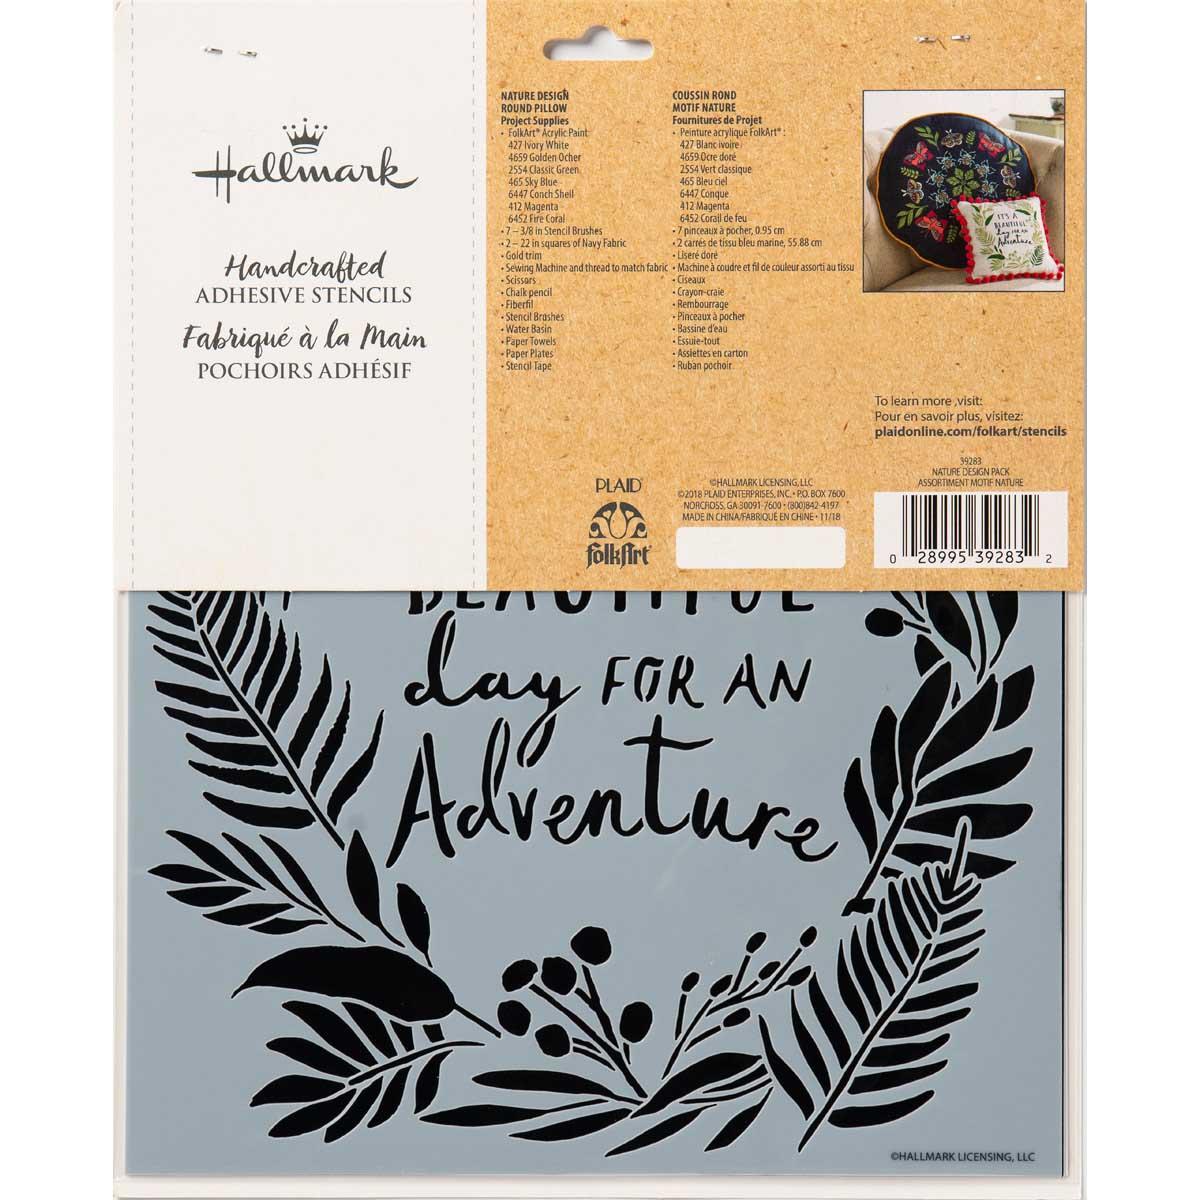 Hallmark Handcrafted Adhesive Stencils - Nature Design Pack, 8-1/2